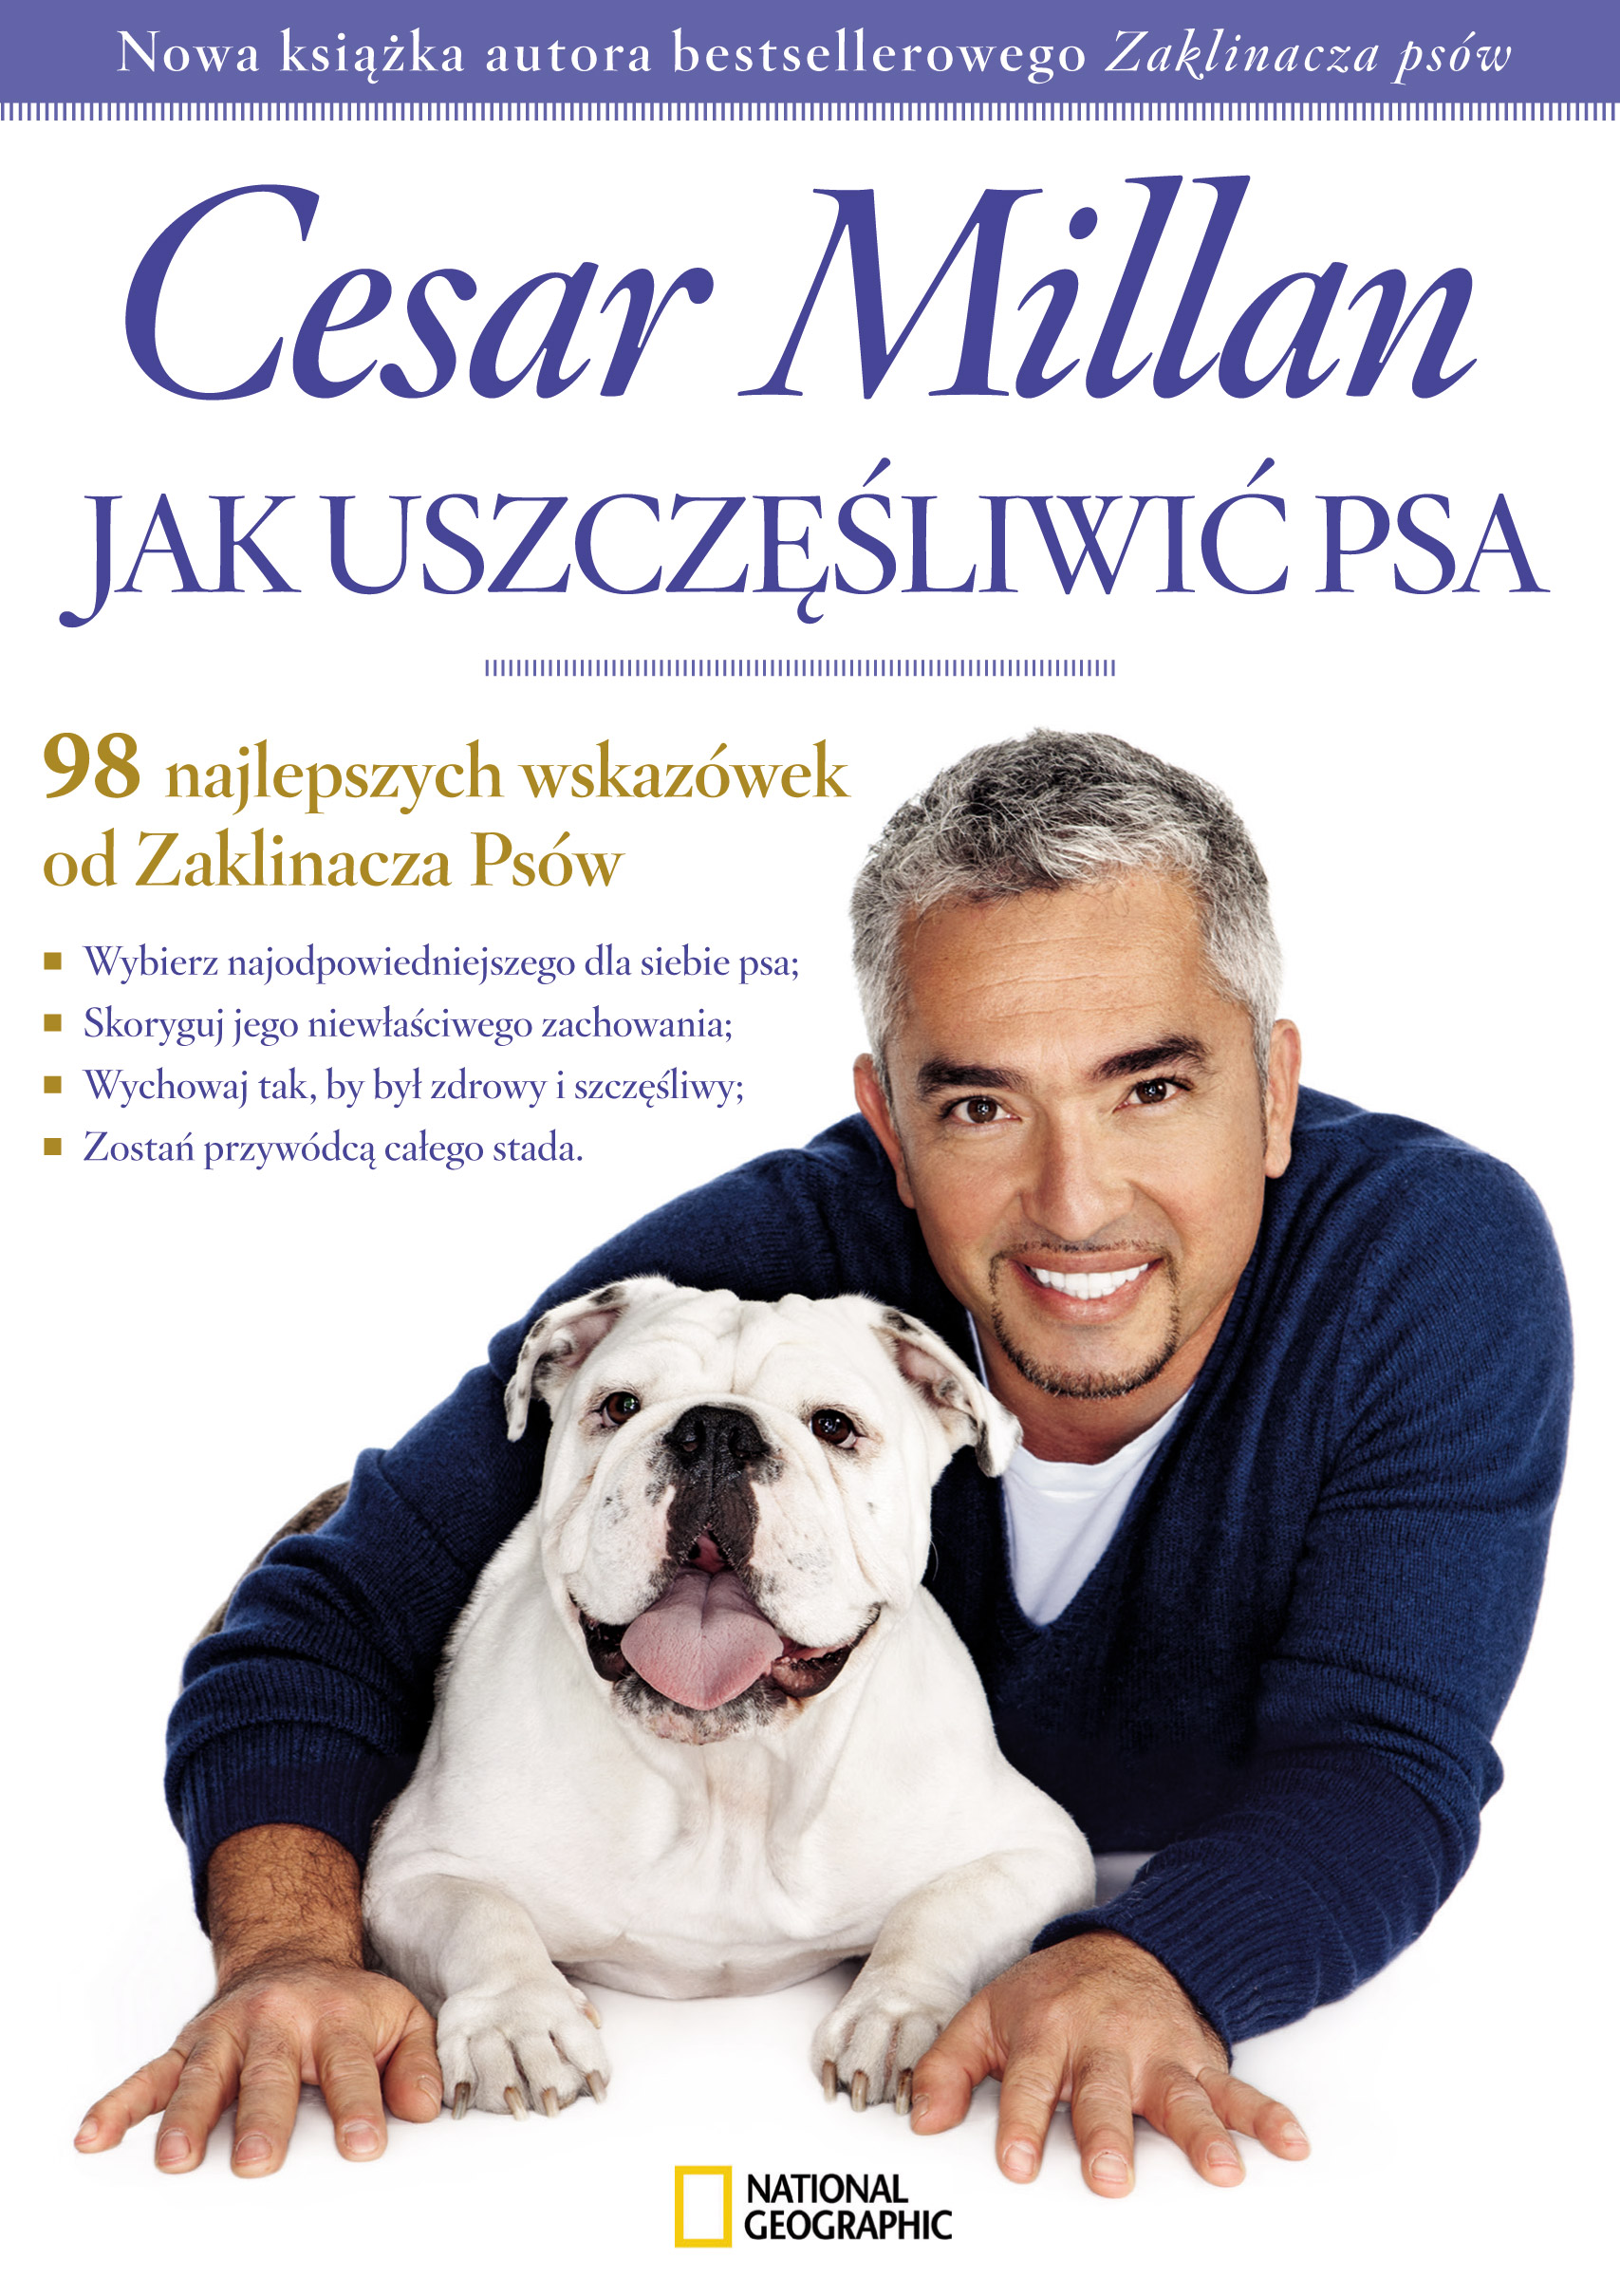 jak uszczęśliwić psa cesar millan